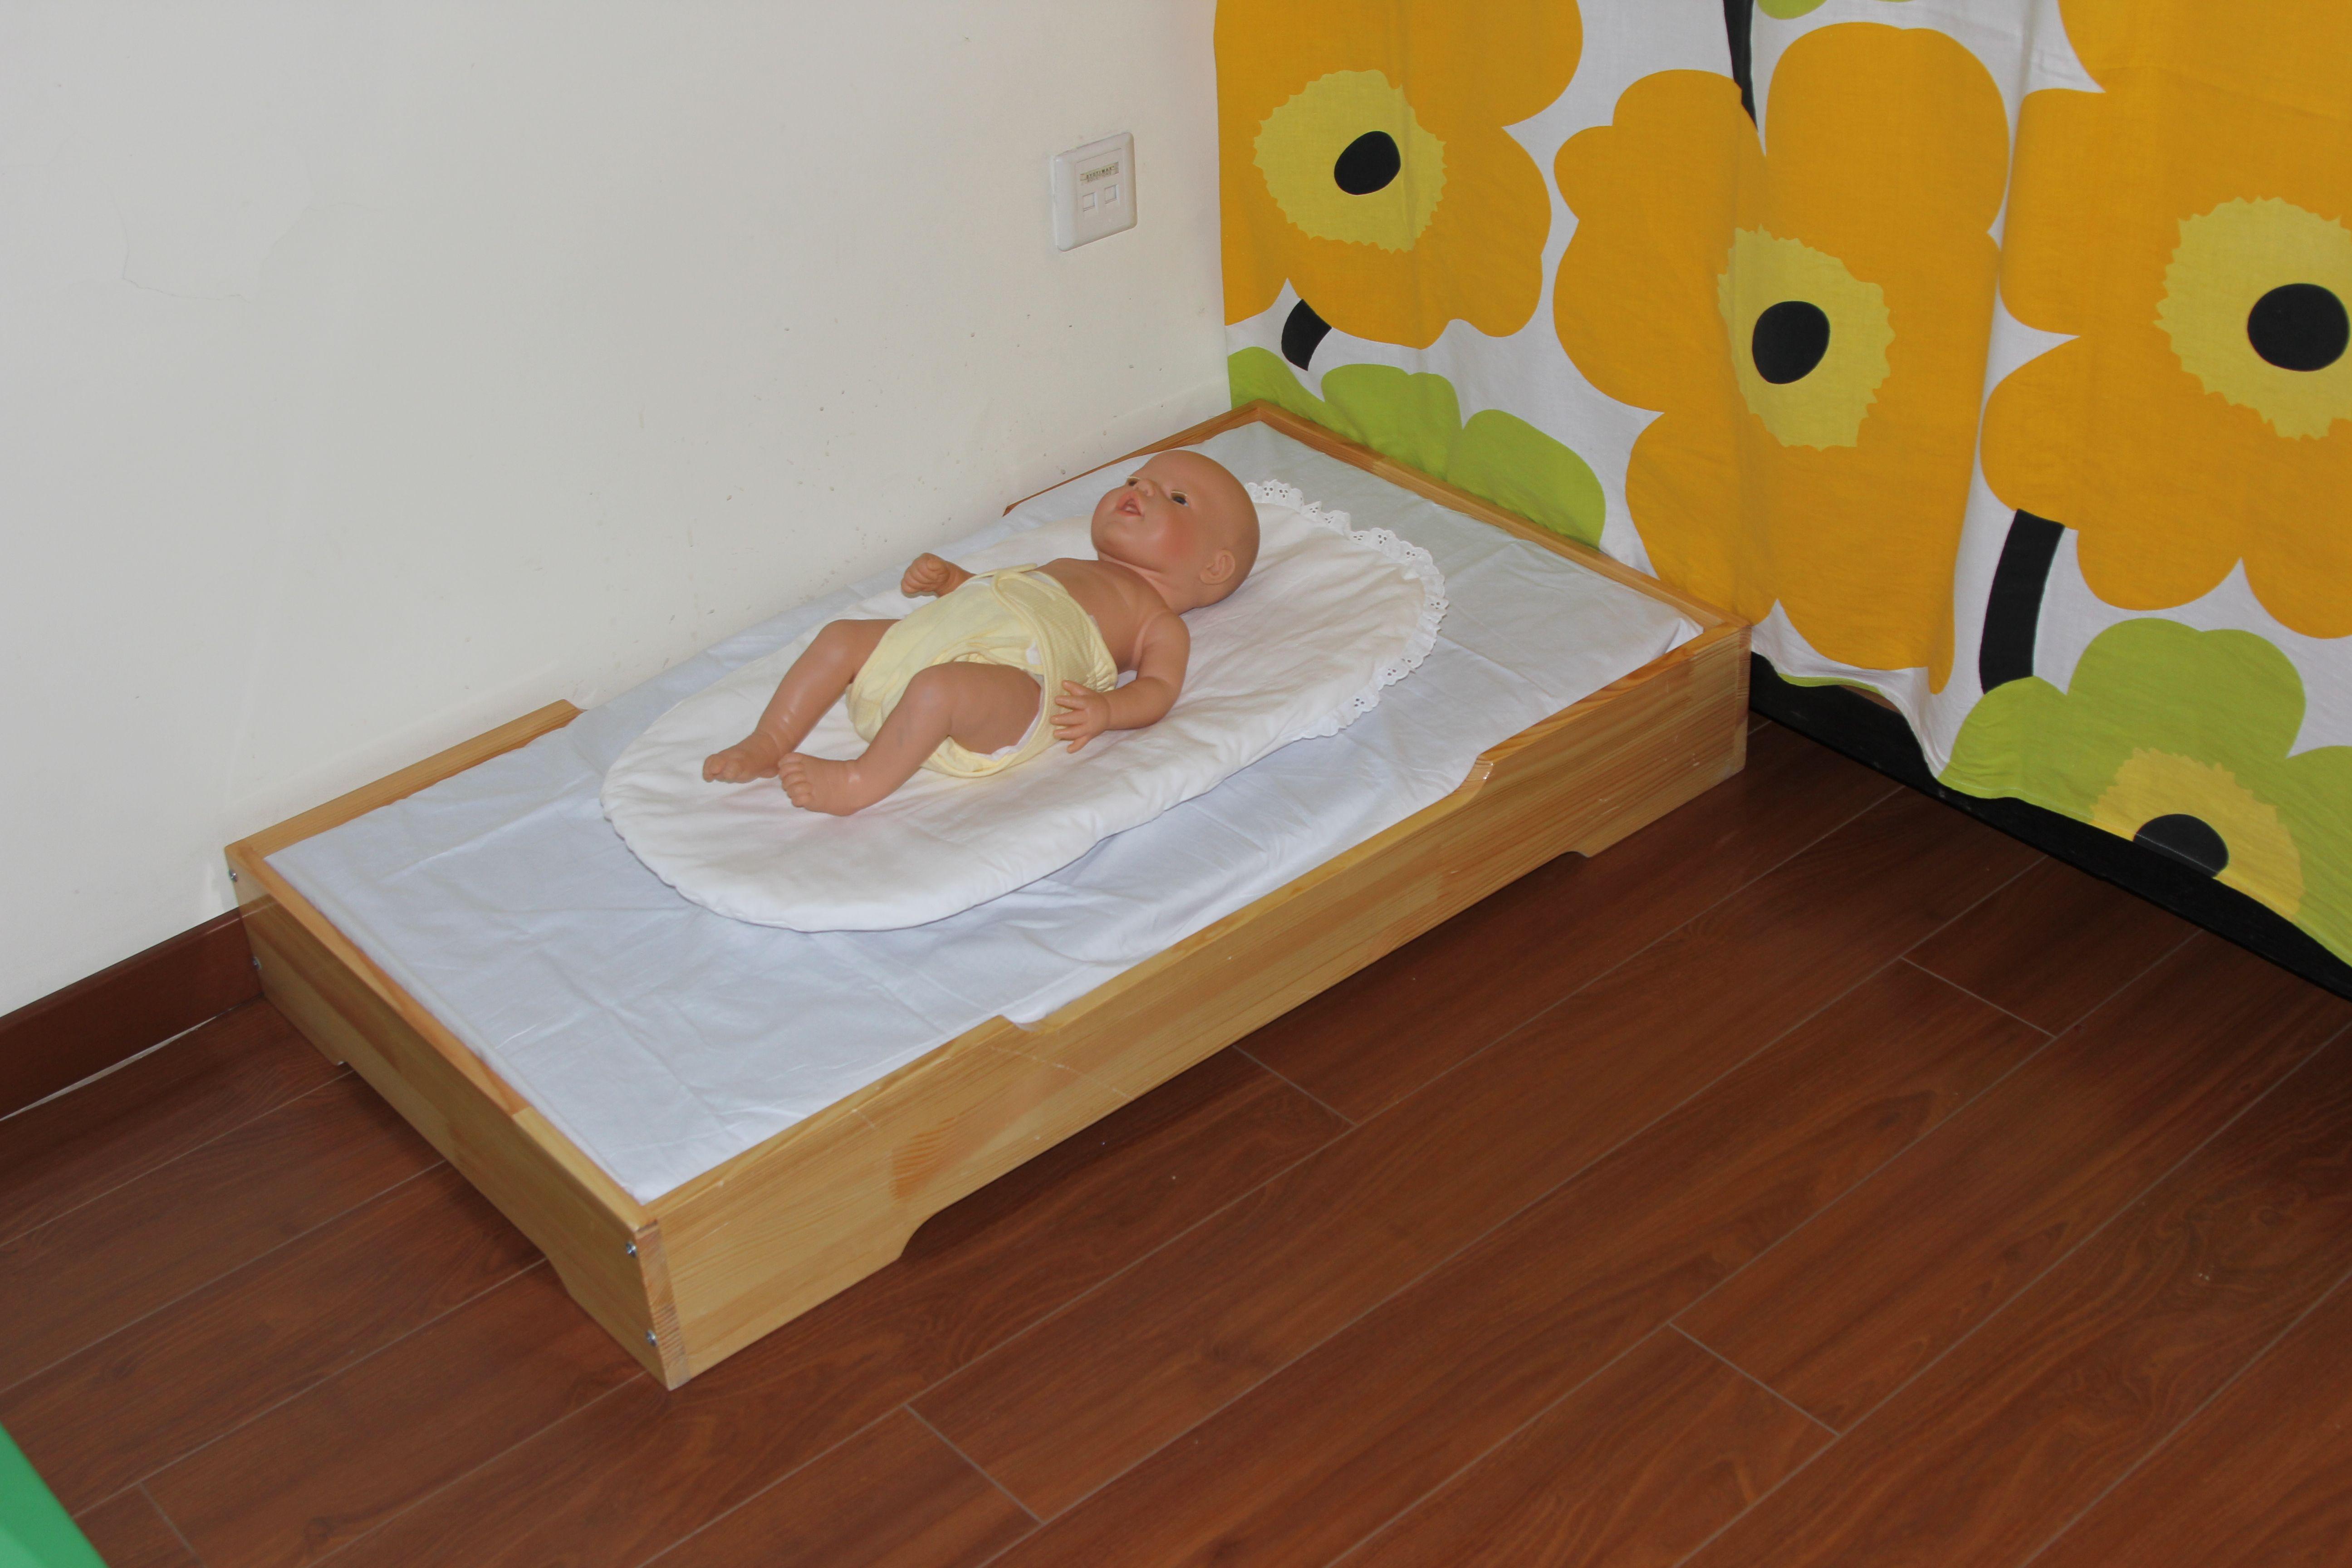 floor bed and toppinchino montessori north montessori infants pinterest montessori and. Black Bedroom Furniture Sets. Home Design Ideas